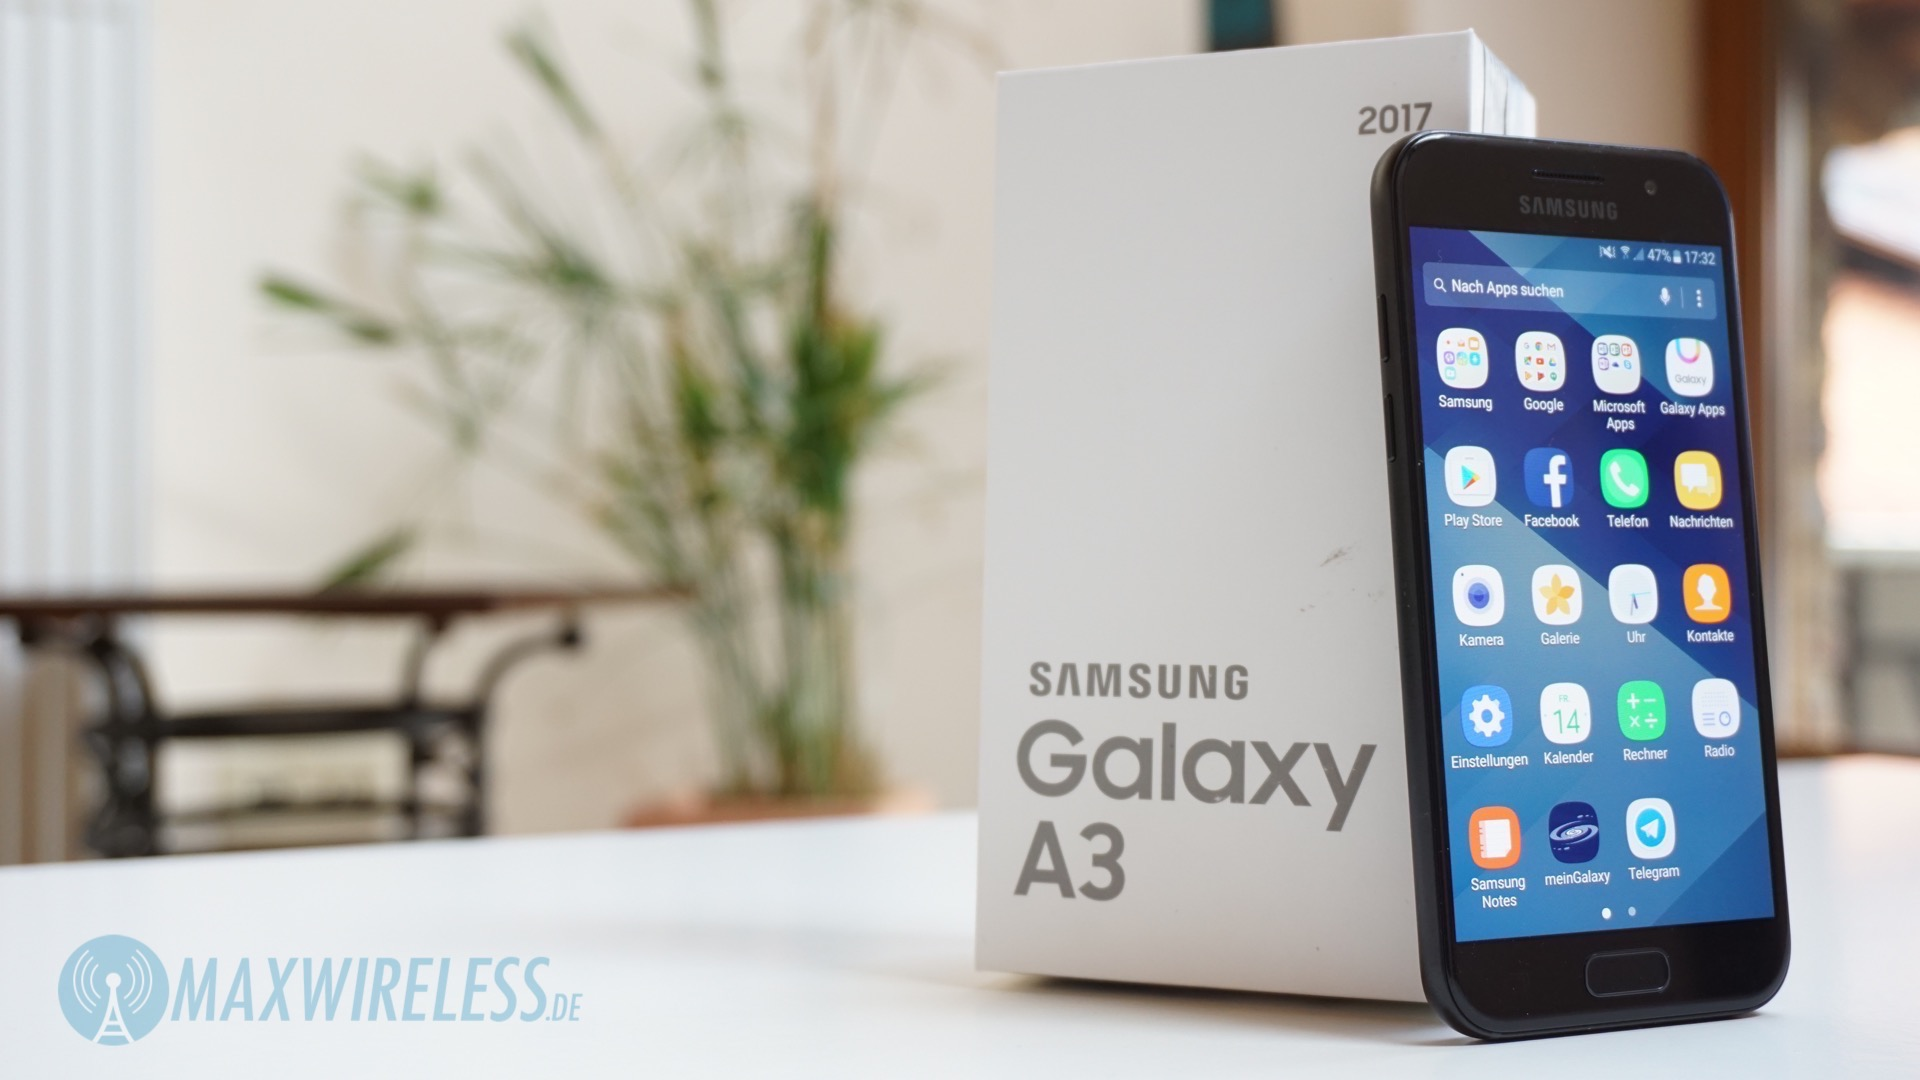 kleines android smartphone im test samsung galaxy a3. Black Bedroom Furniture Sets. Home Design Ideas